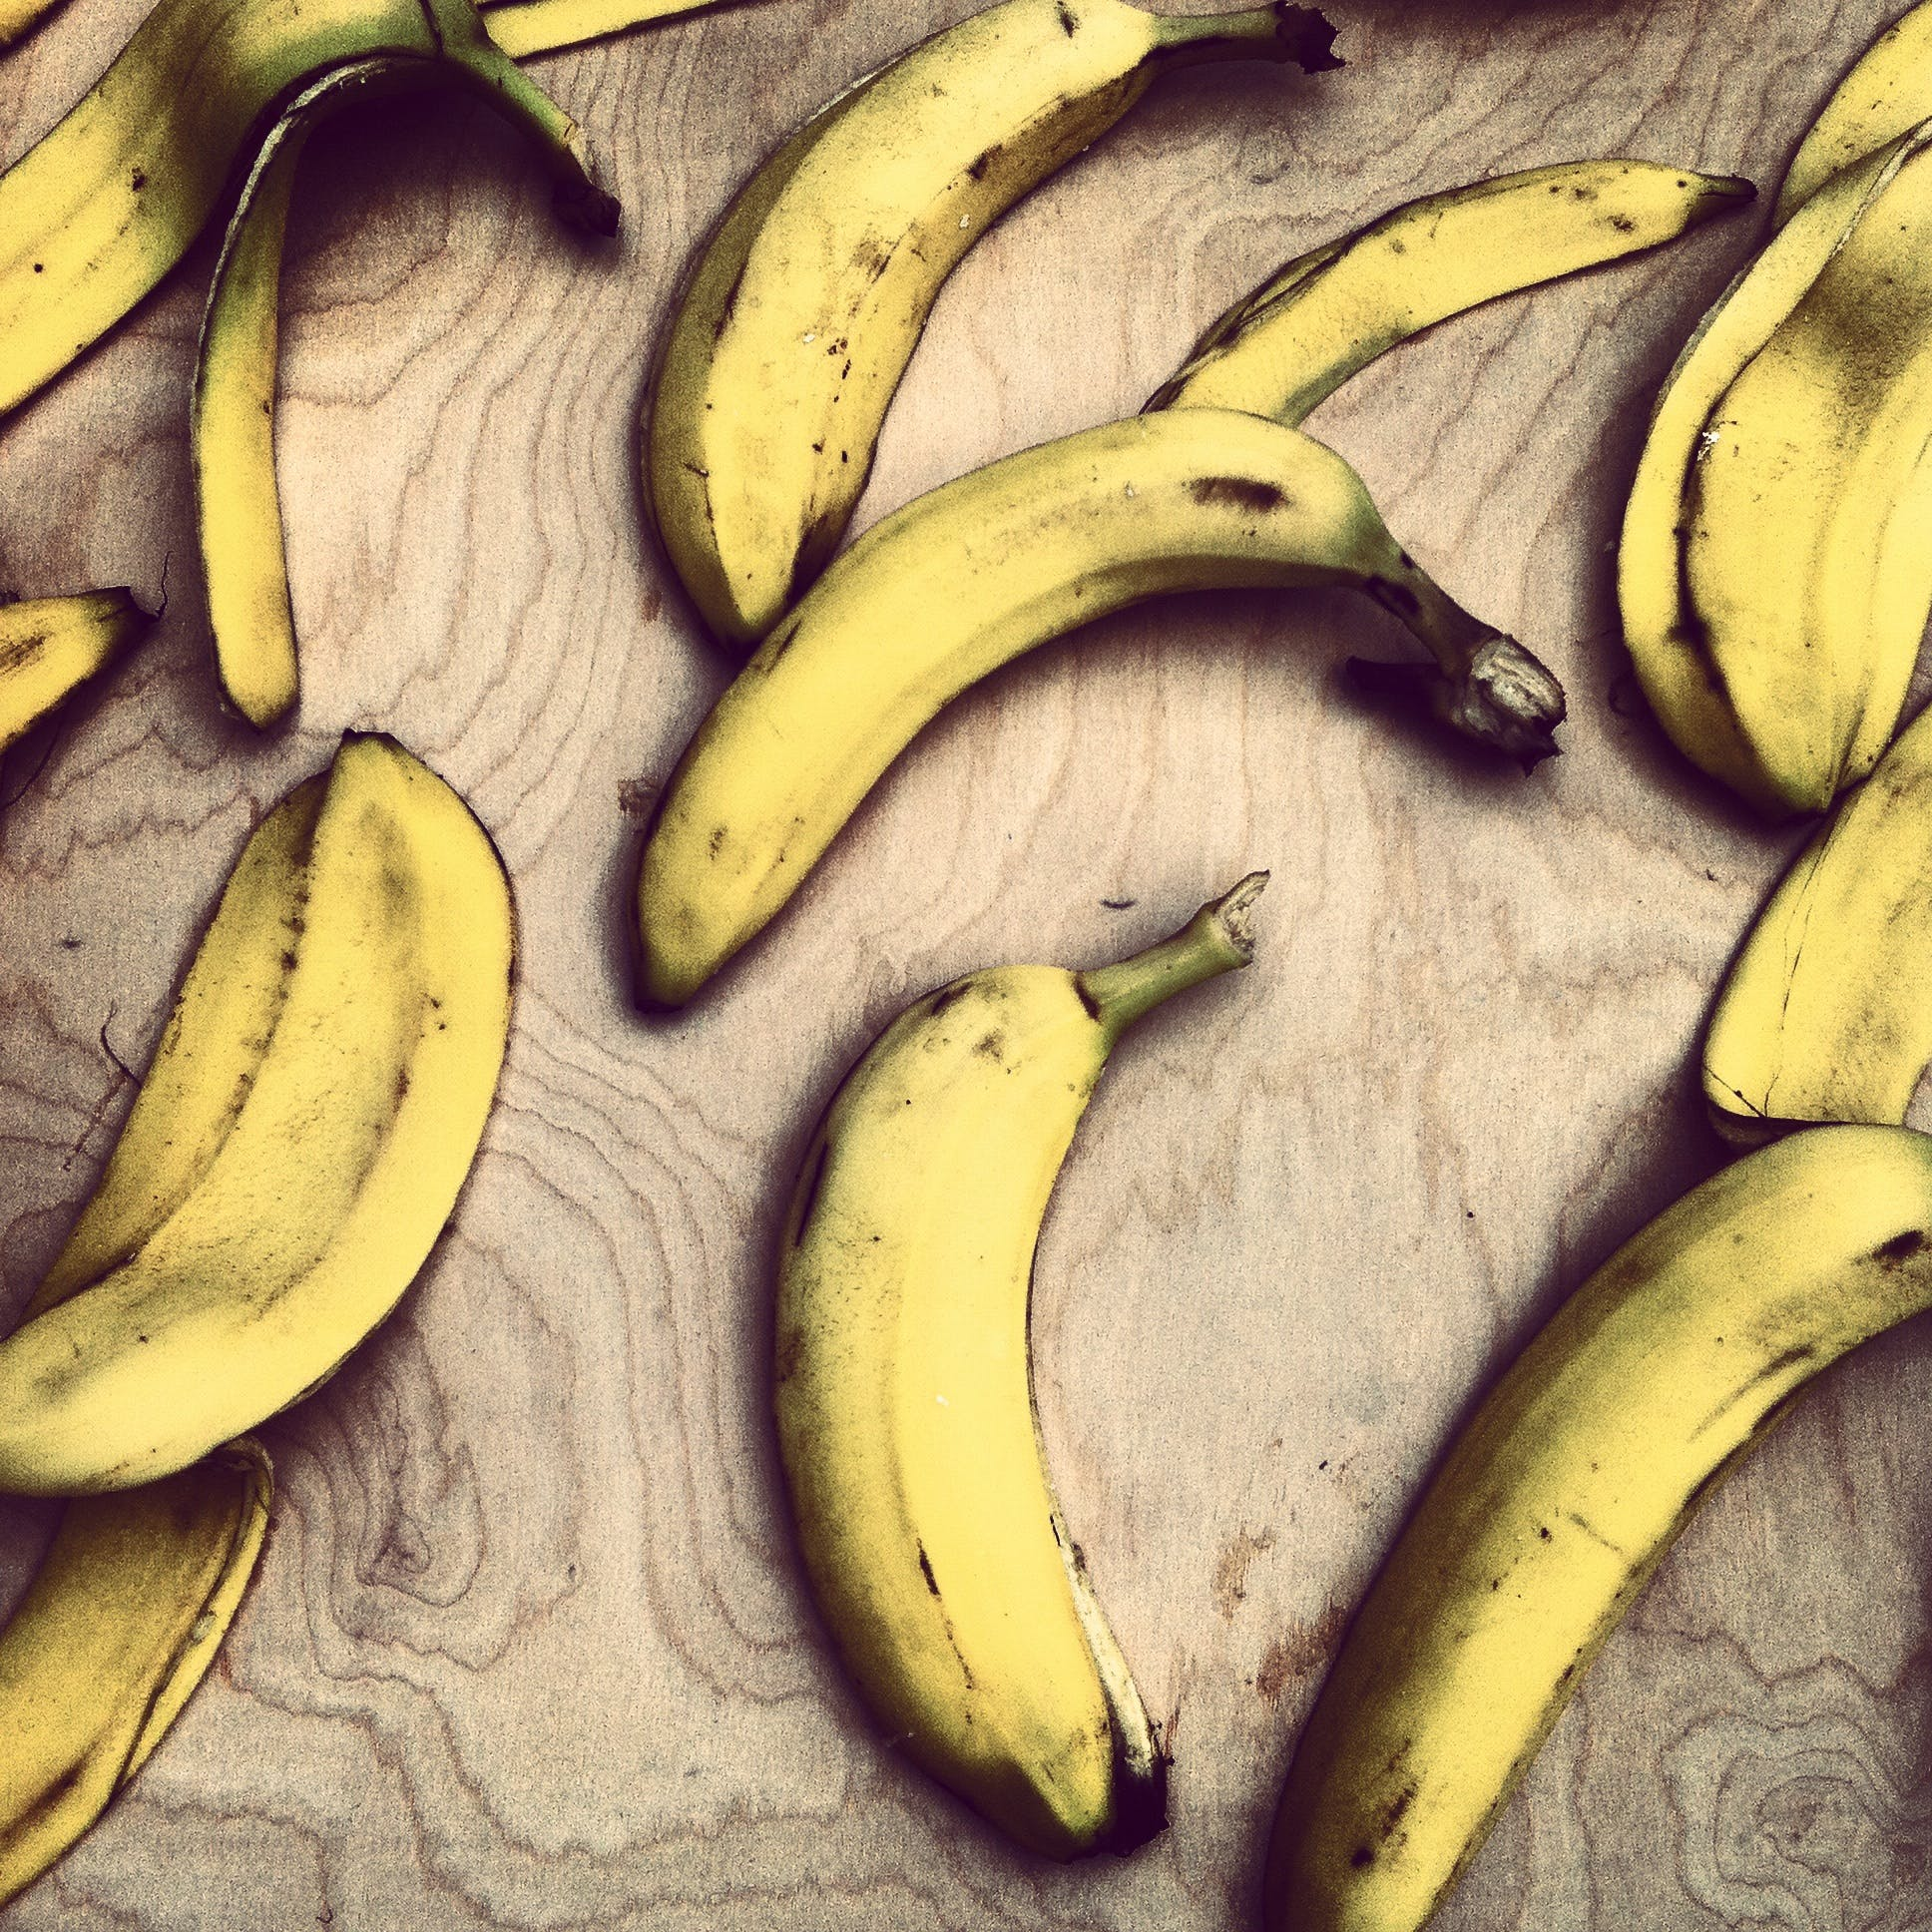 Free stock photo of bananas